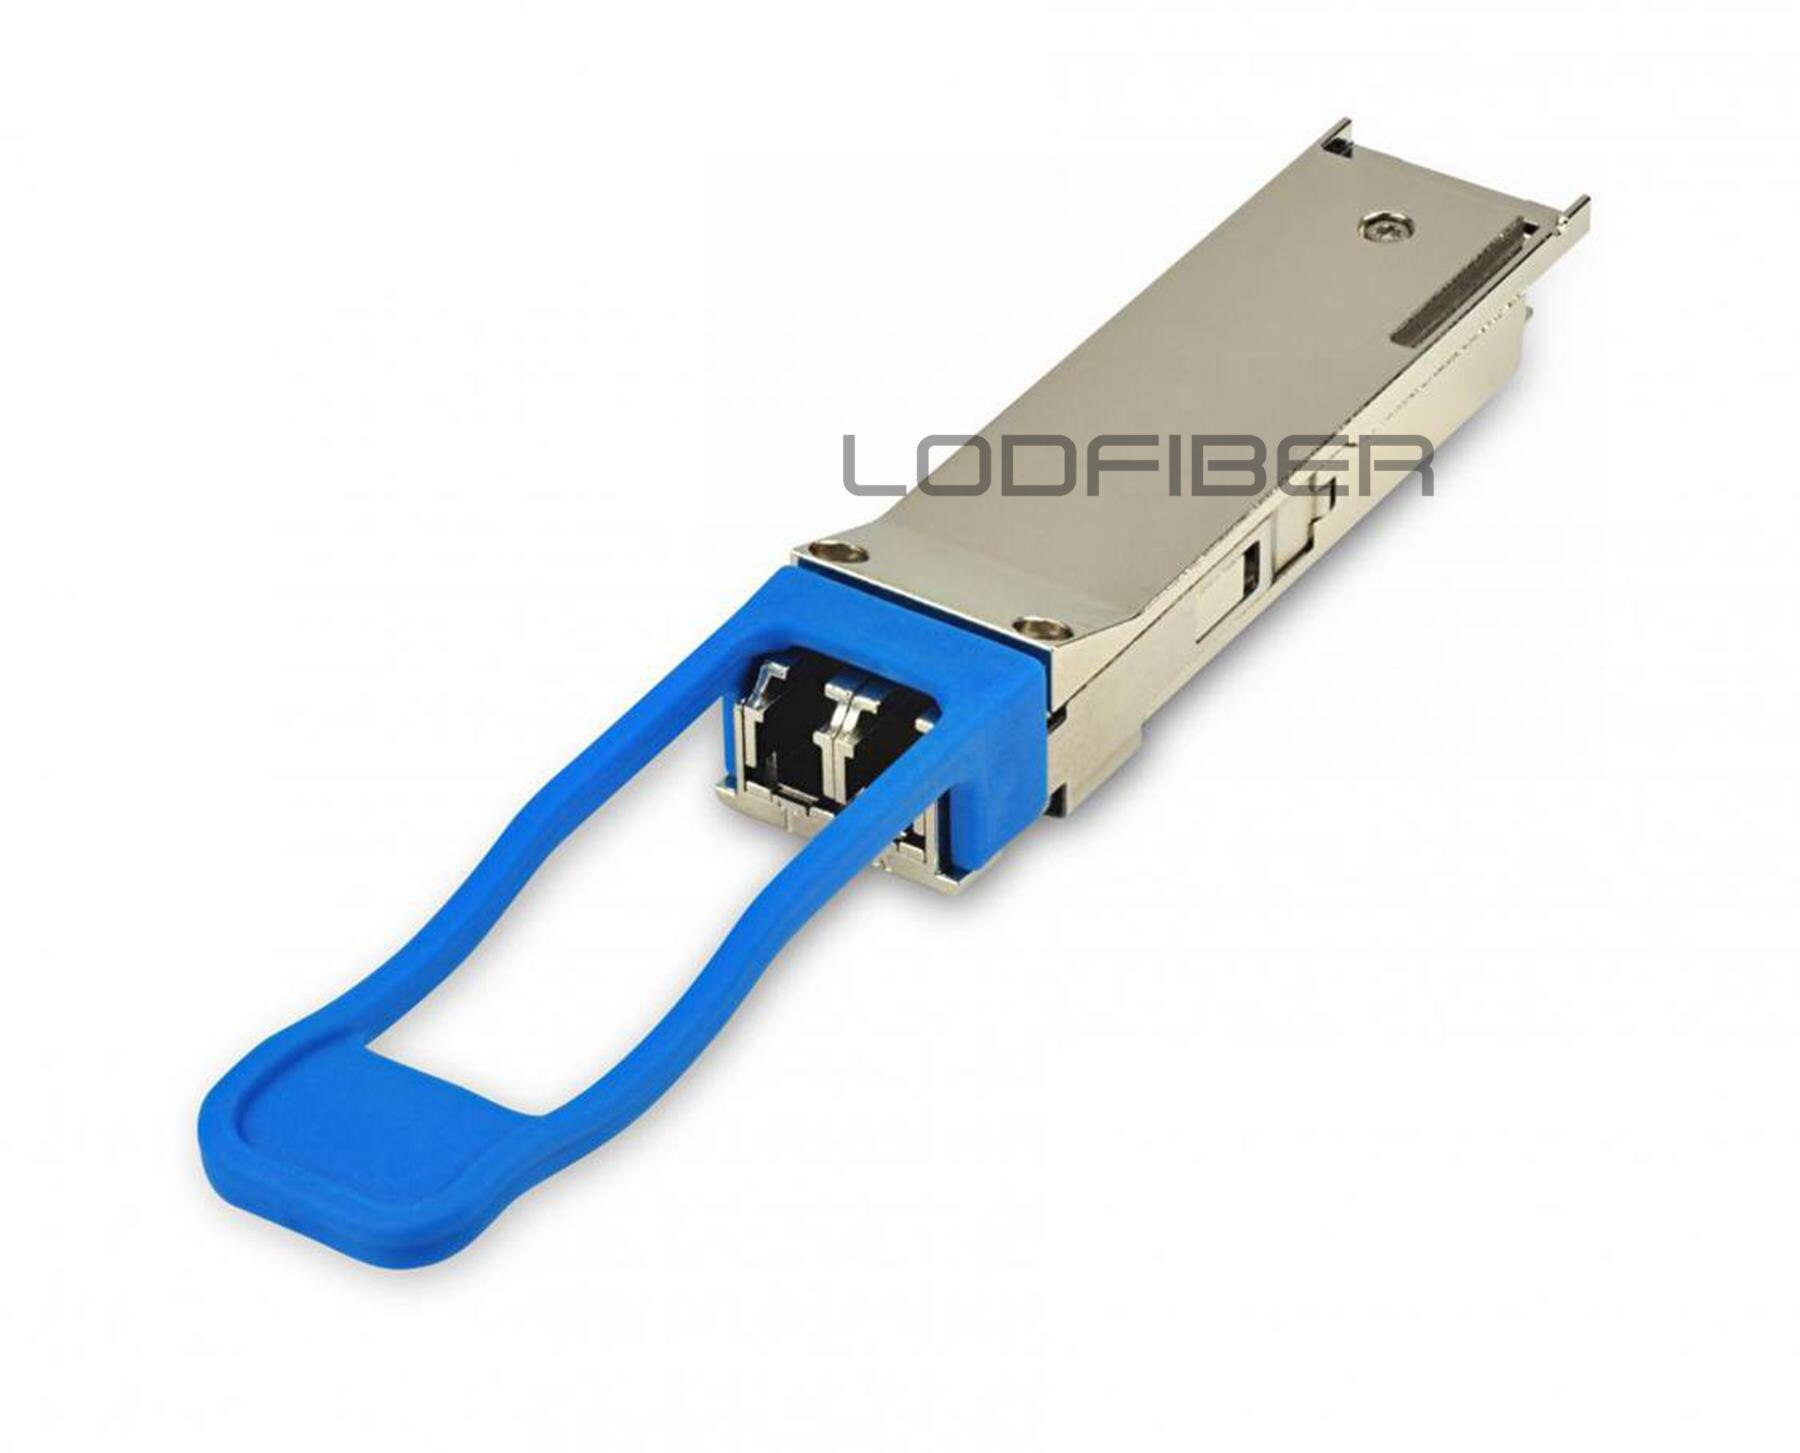 LODFIBER QSFP-40G-LR A-l-c-a-t-e-l-L-u-c-e-n-t Compatível Transceptor 40GBASE-LR4 QSFP + DOM 1310nm 10 km